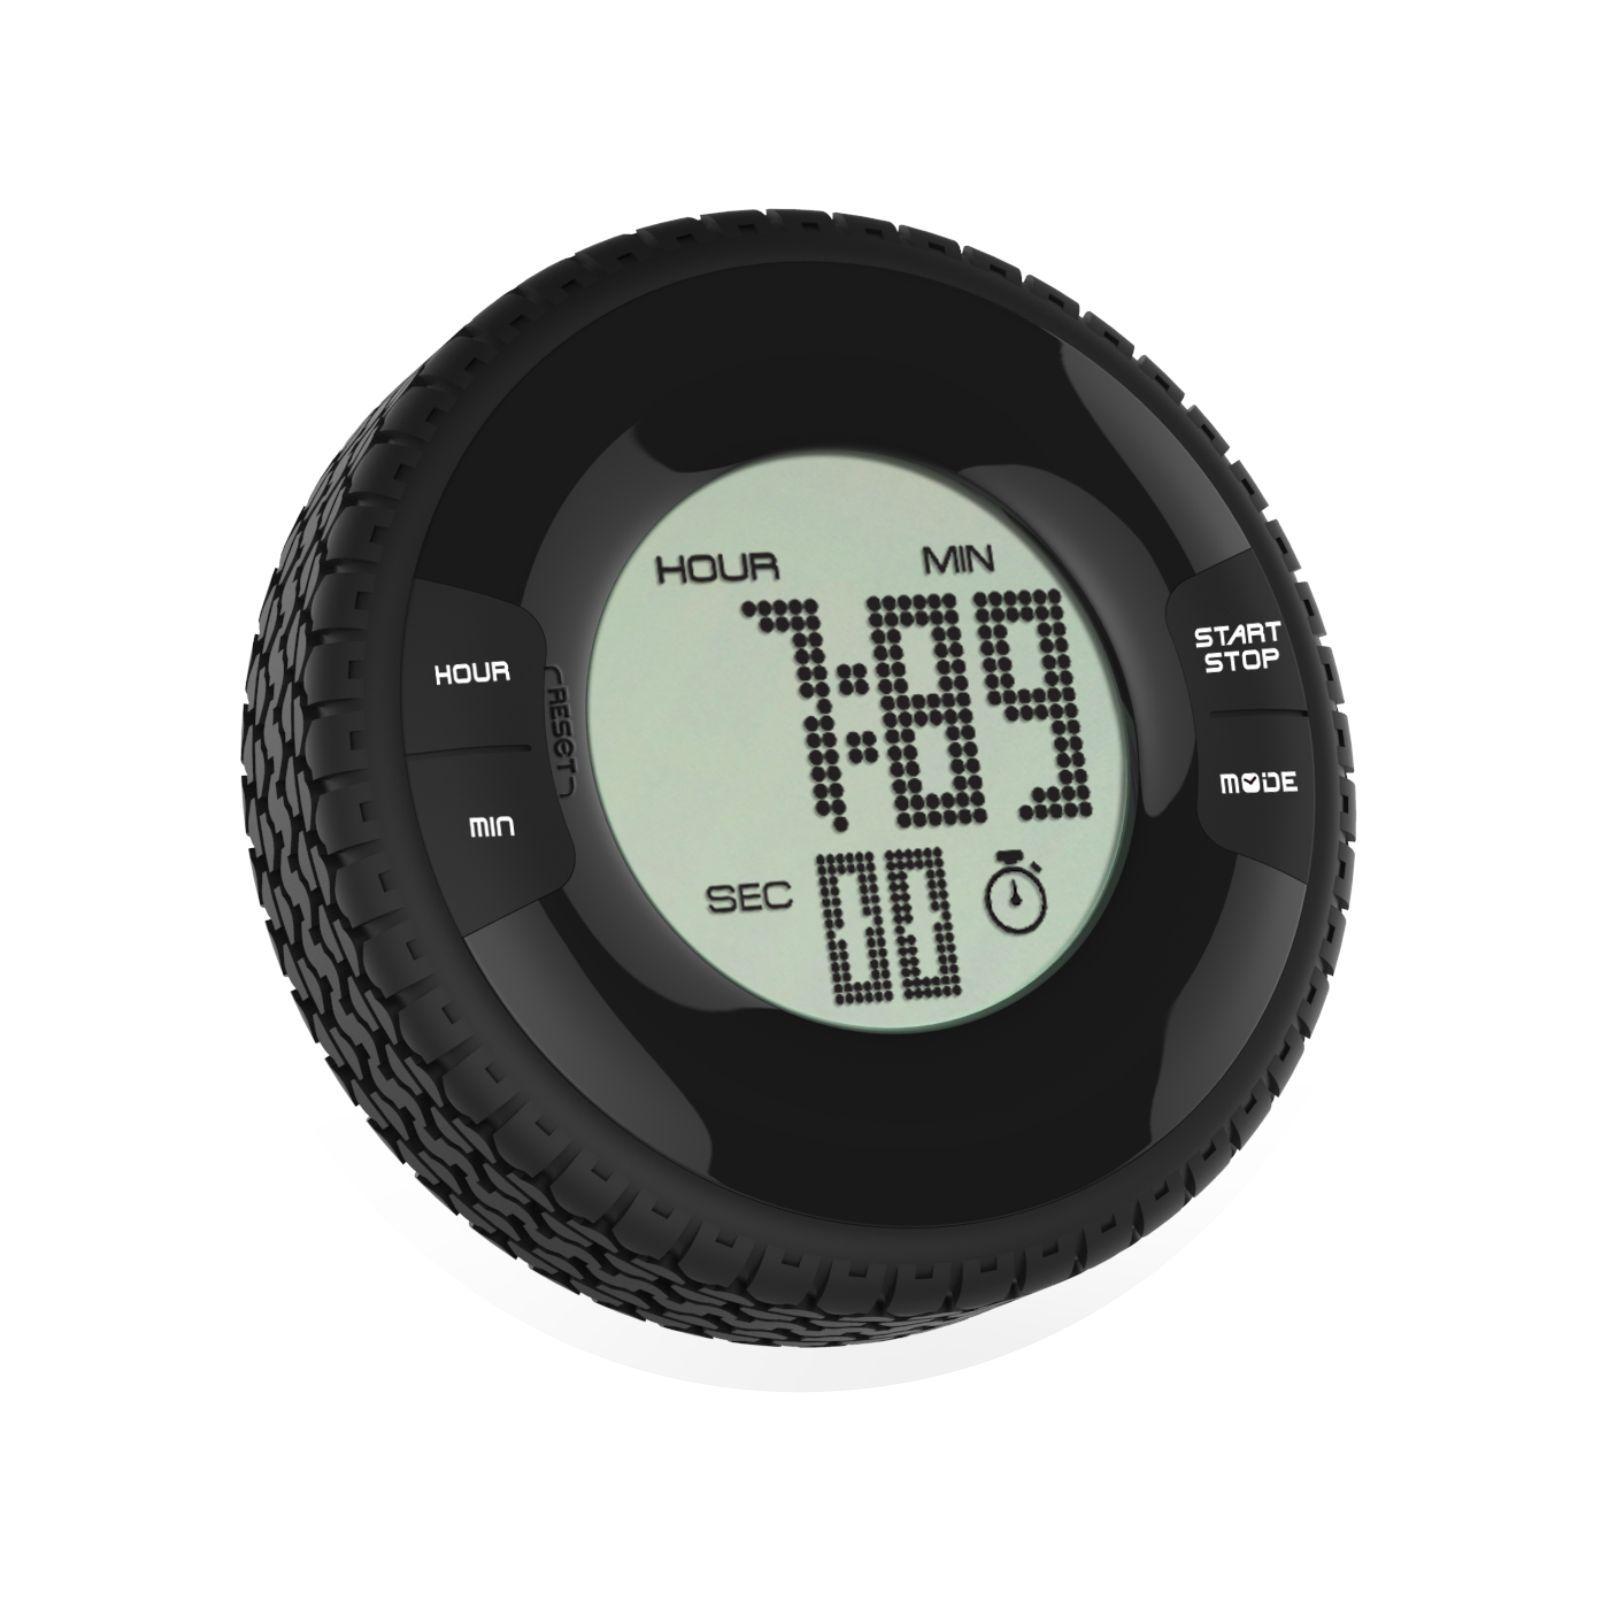 Bathroom Waterproof Fashion Tire Shape Electronic Digital Clock Timer With Fridge Magnet